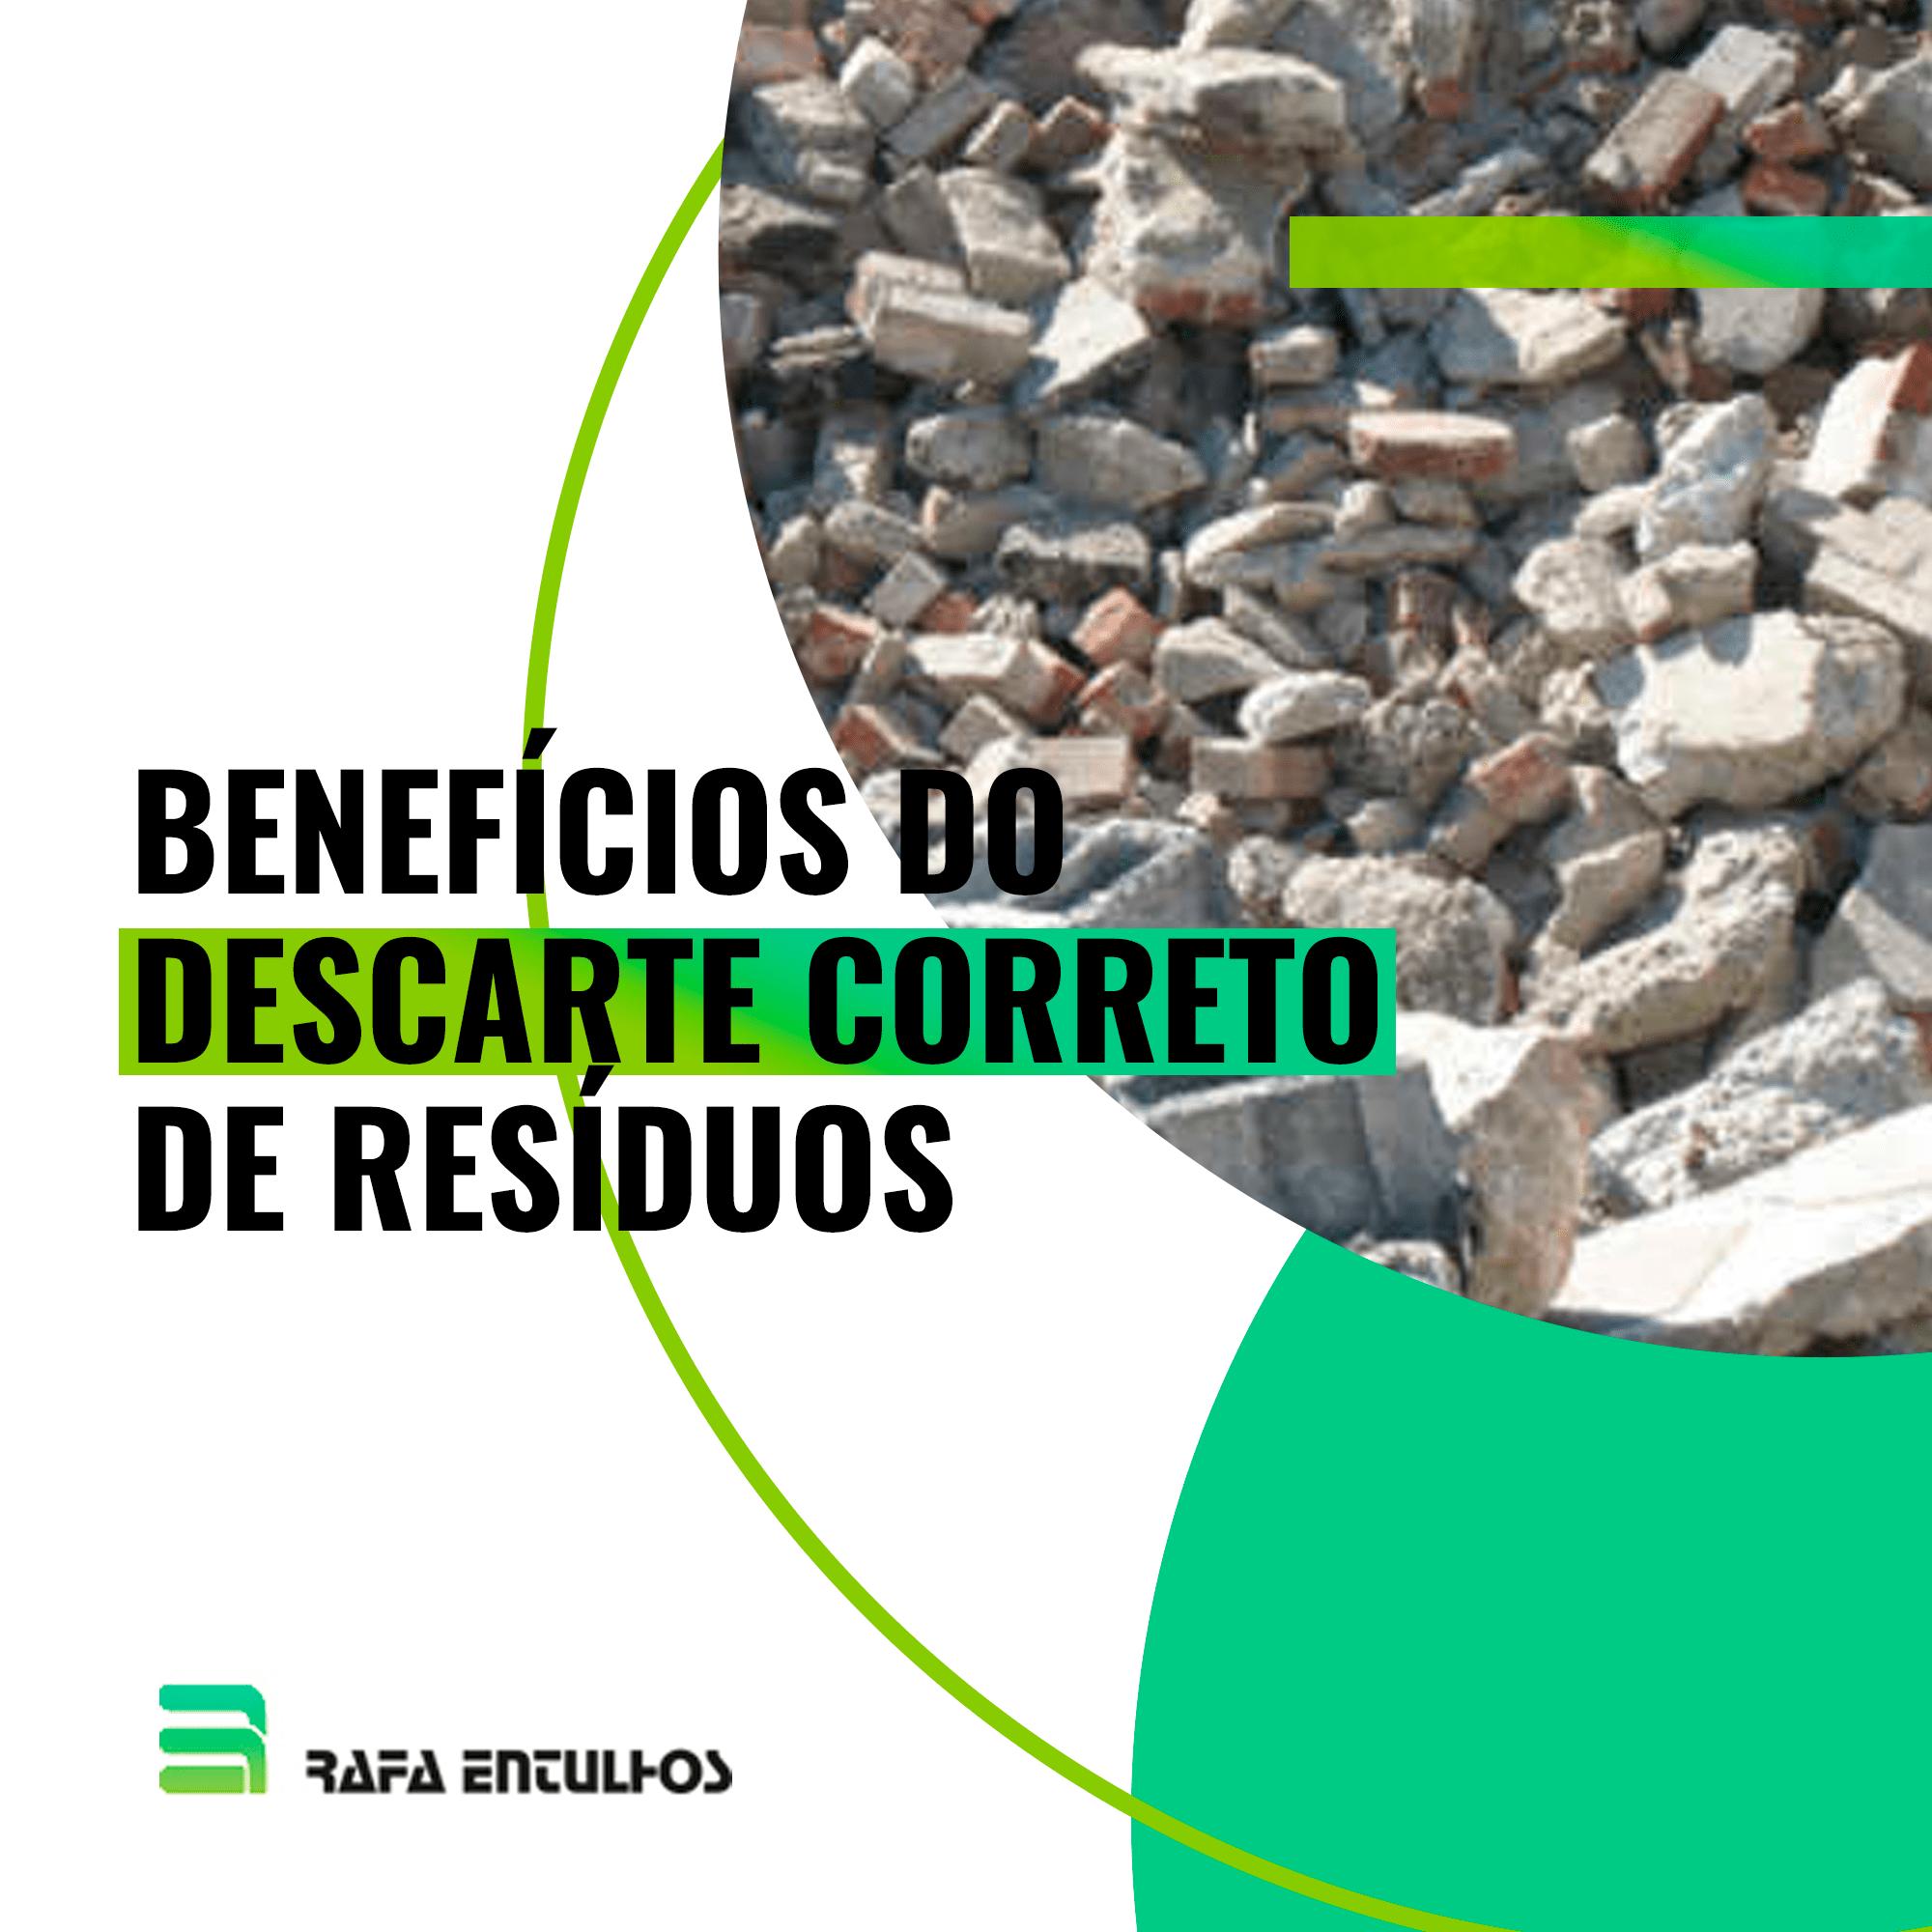 Benefícios do descarte correto de resíduos